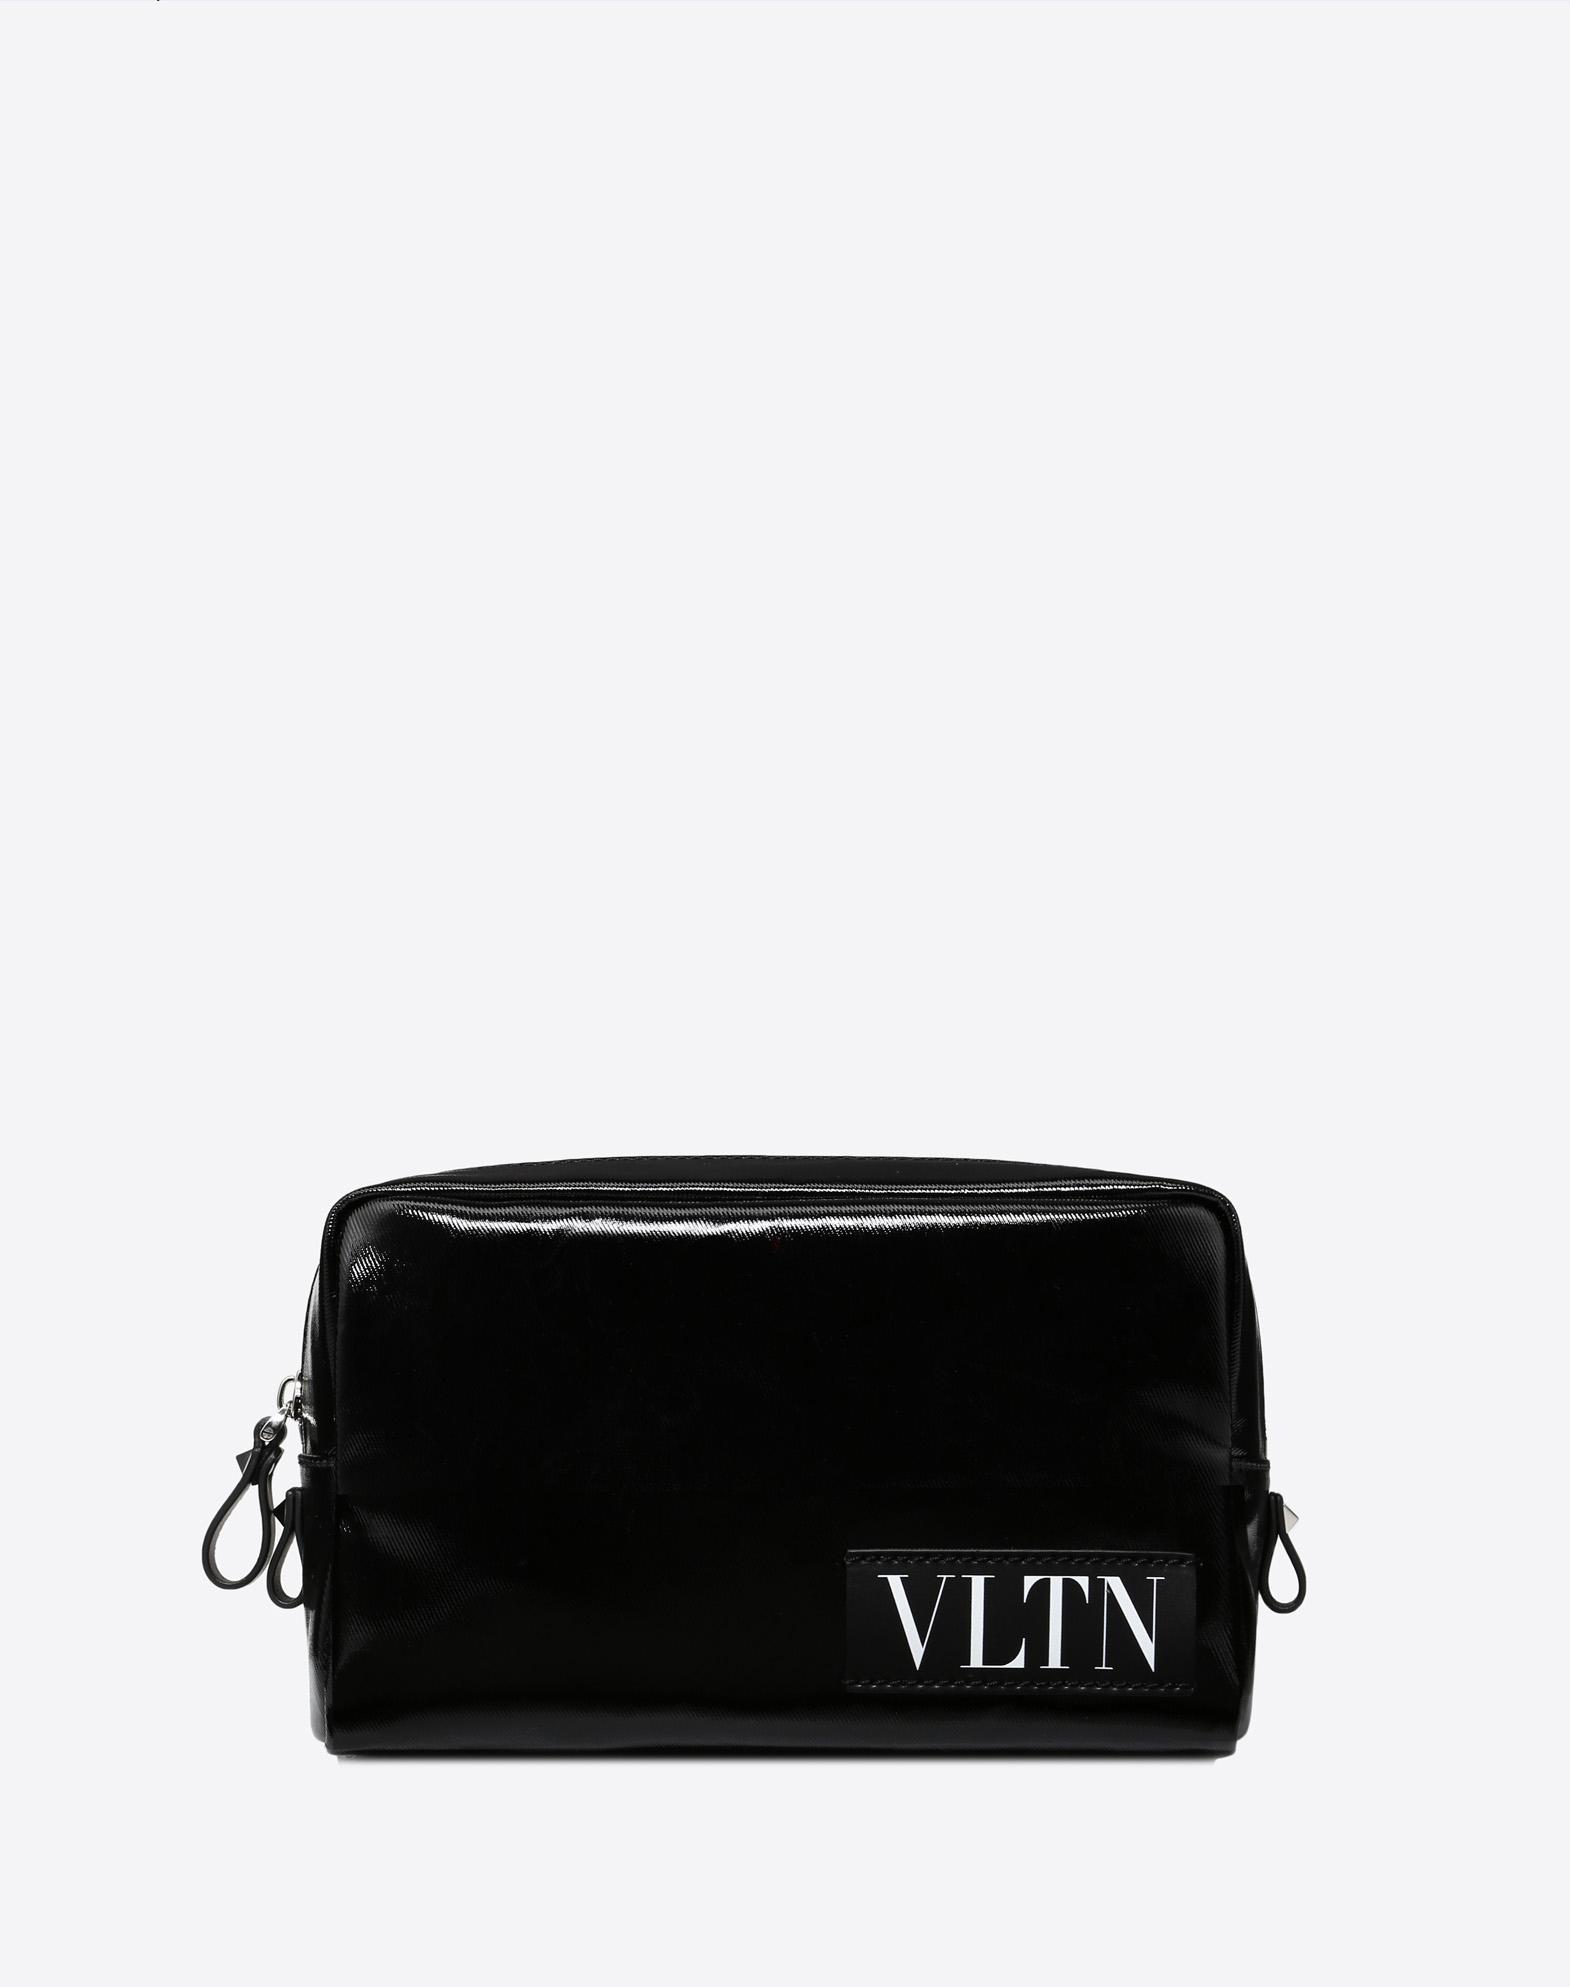 VLTN Makeup Bag